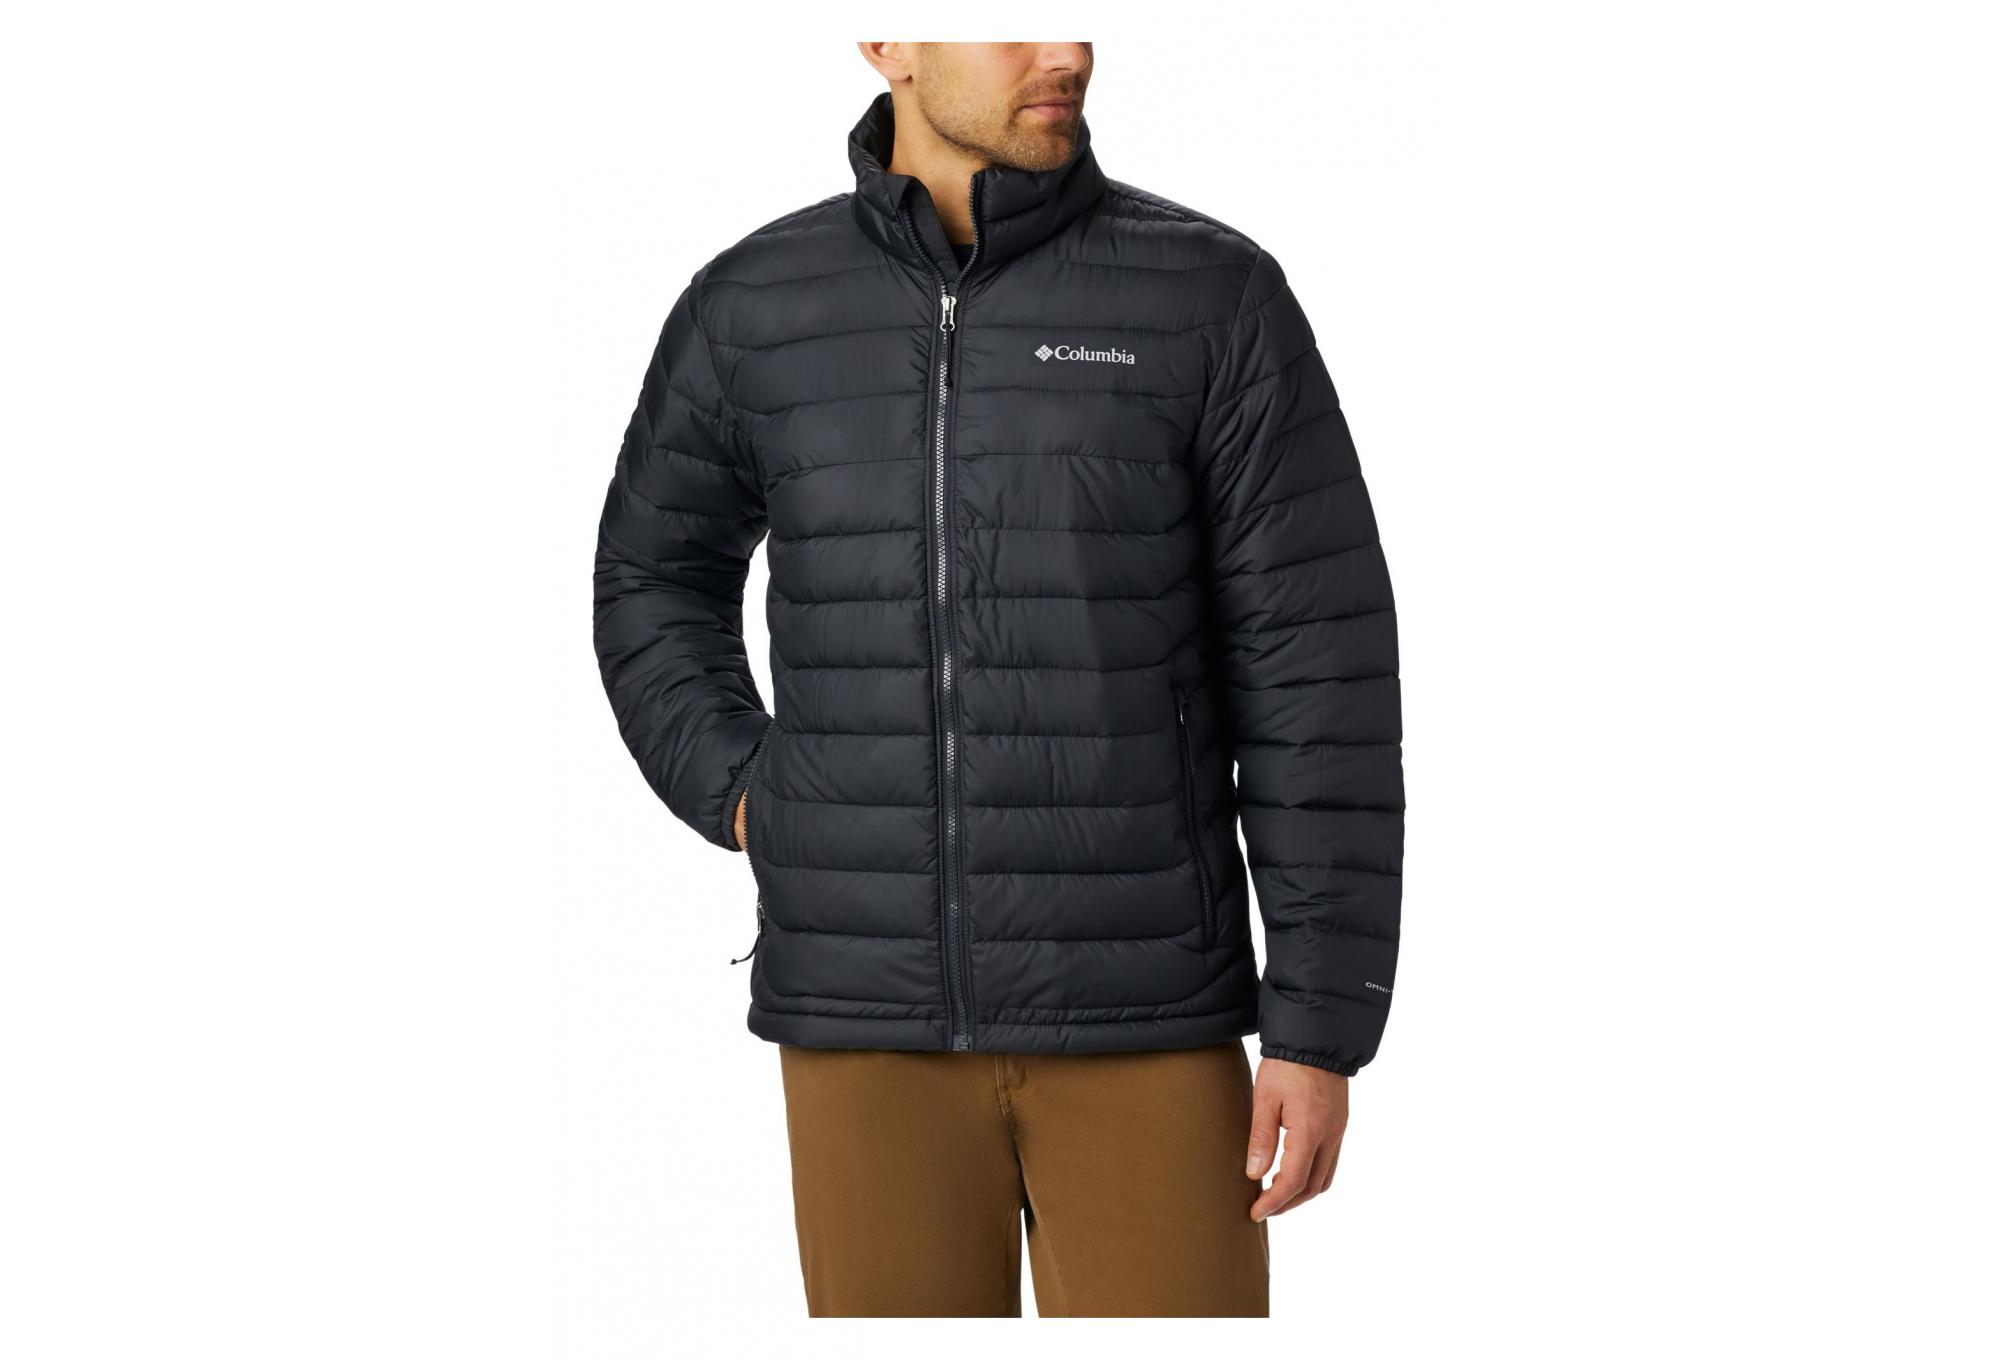 COLUMBIA Powder Lite Jacket Men's Black